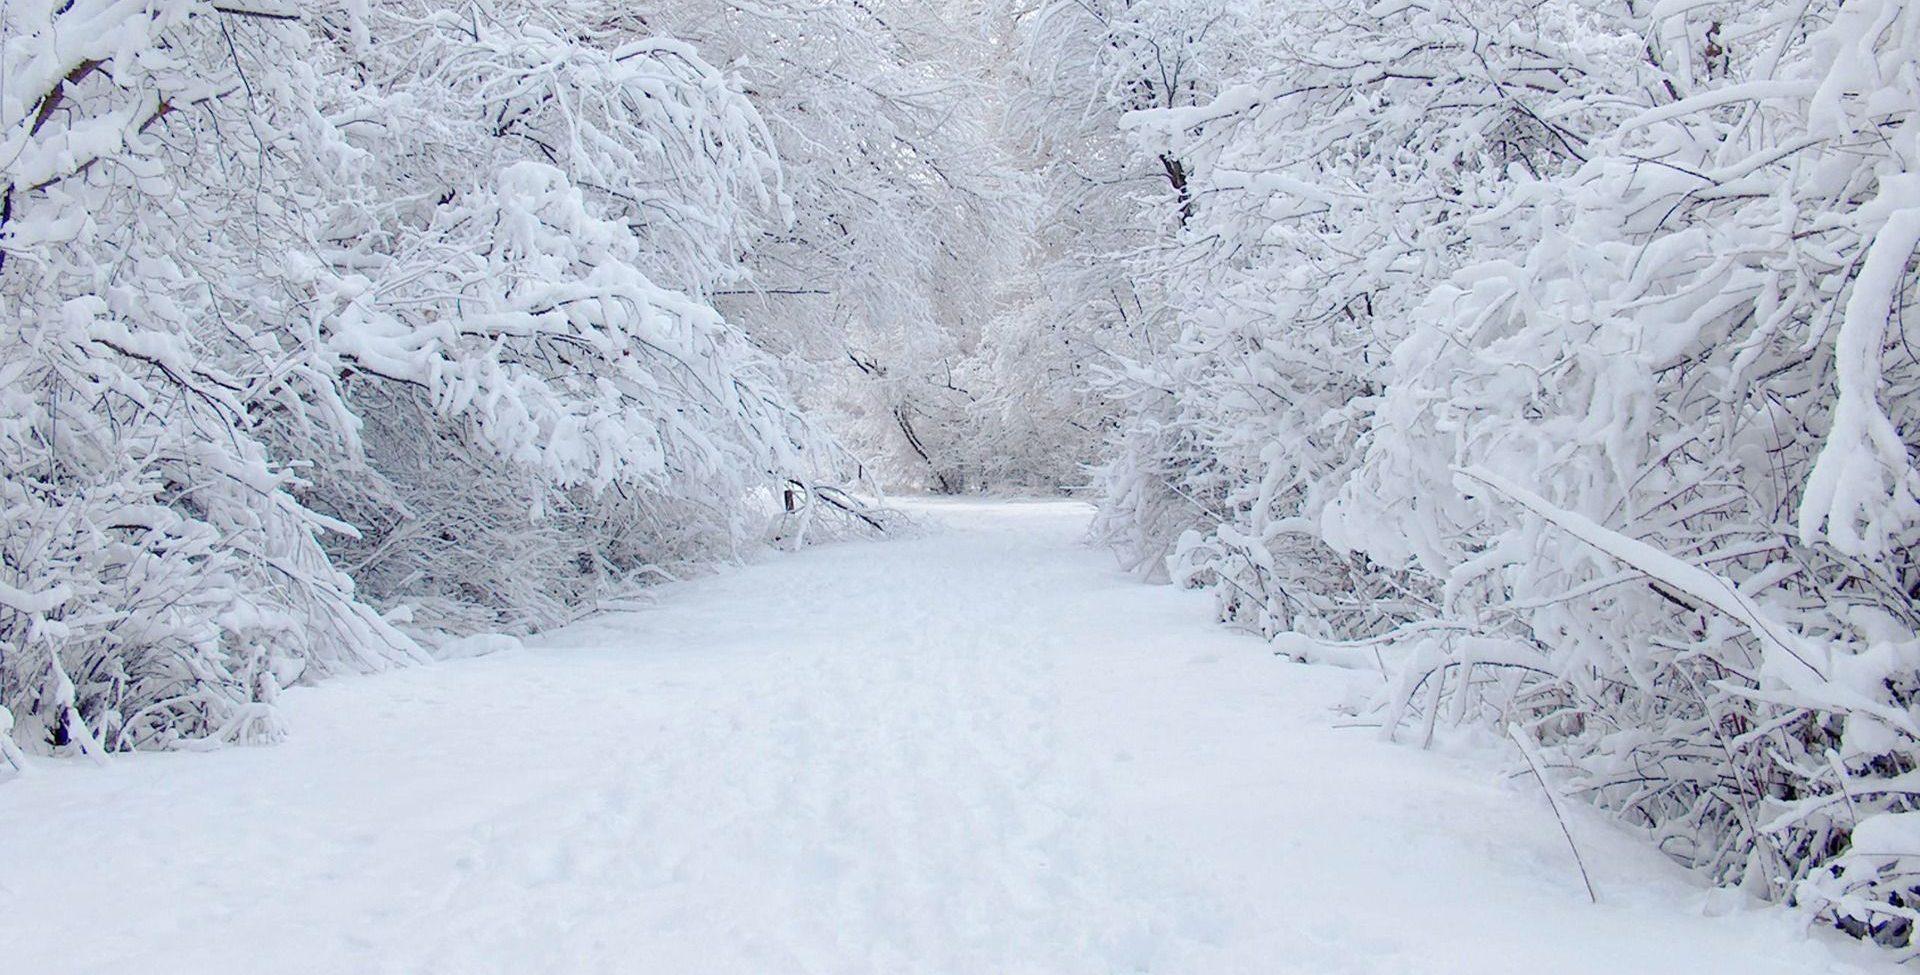 EMERGENCY PREPAREDNESS – Winter Weather